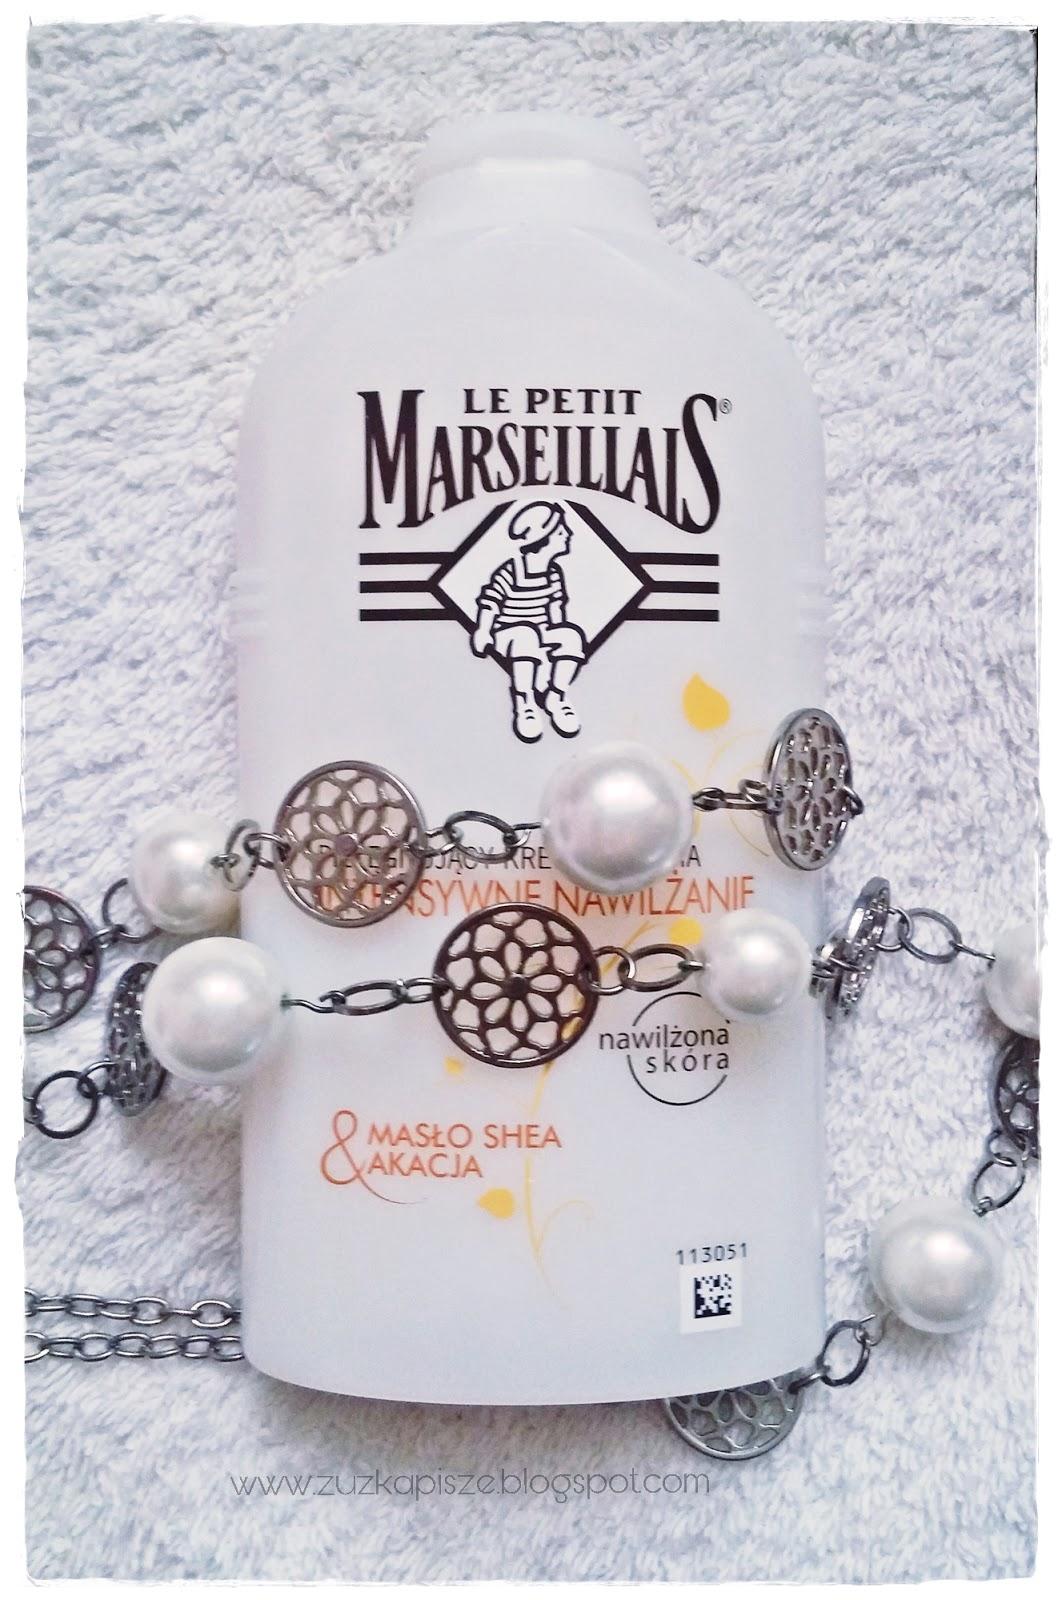 krem do mycia ciała Mało Shea & Akacja od Le Petit Marseillais.